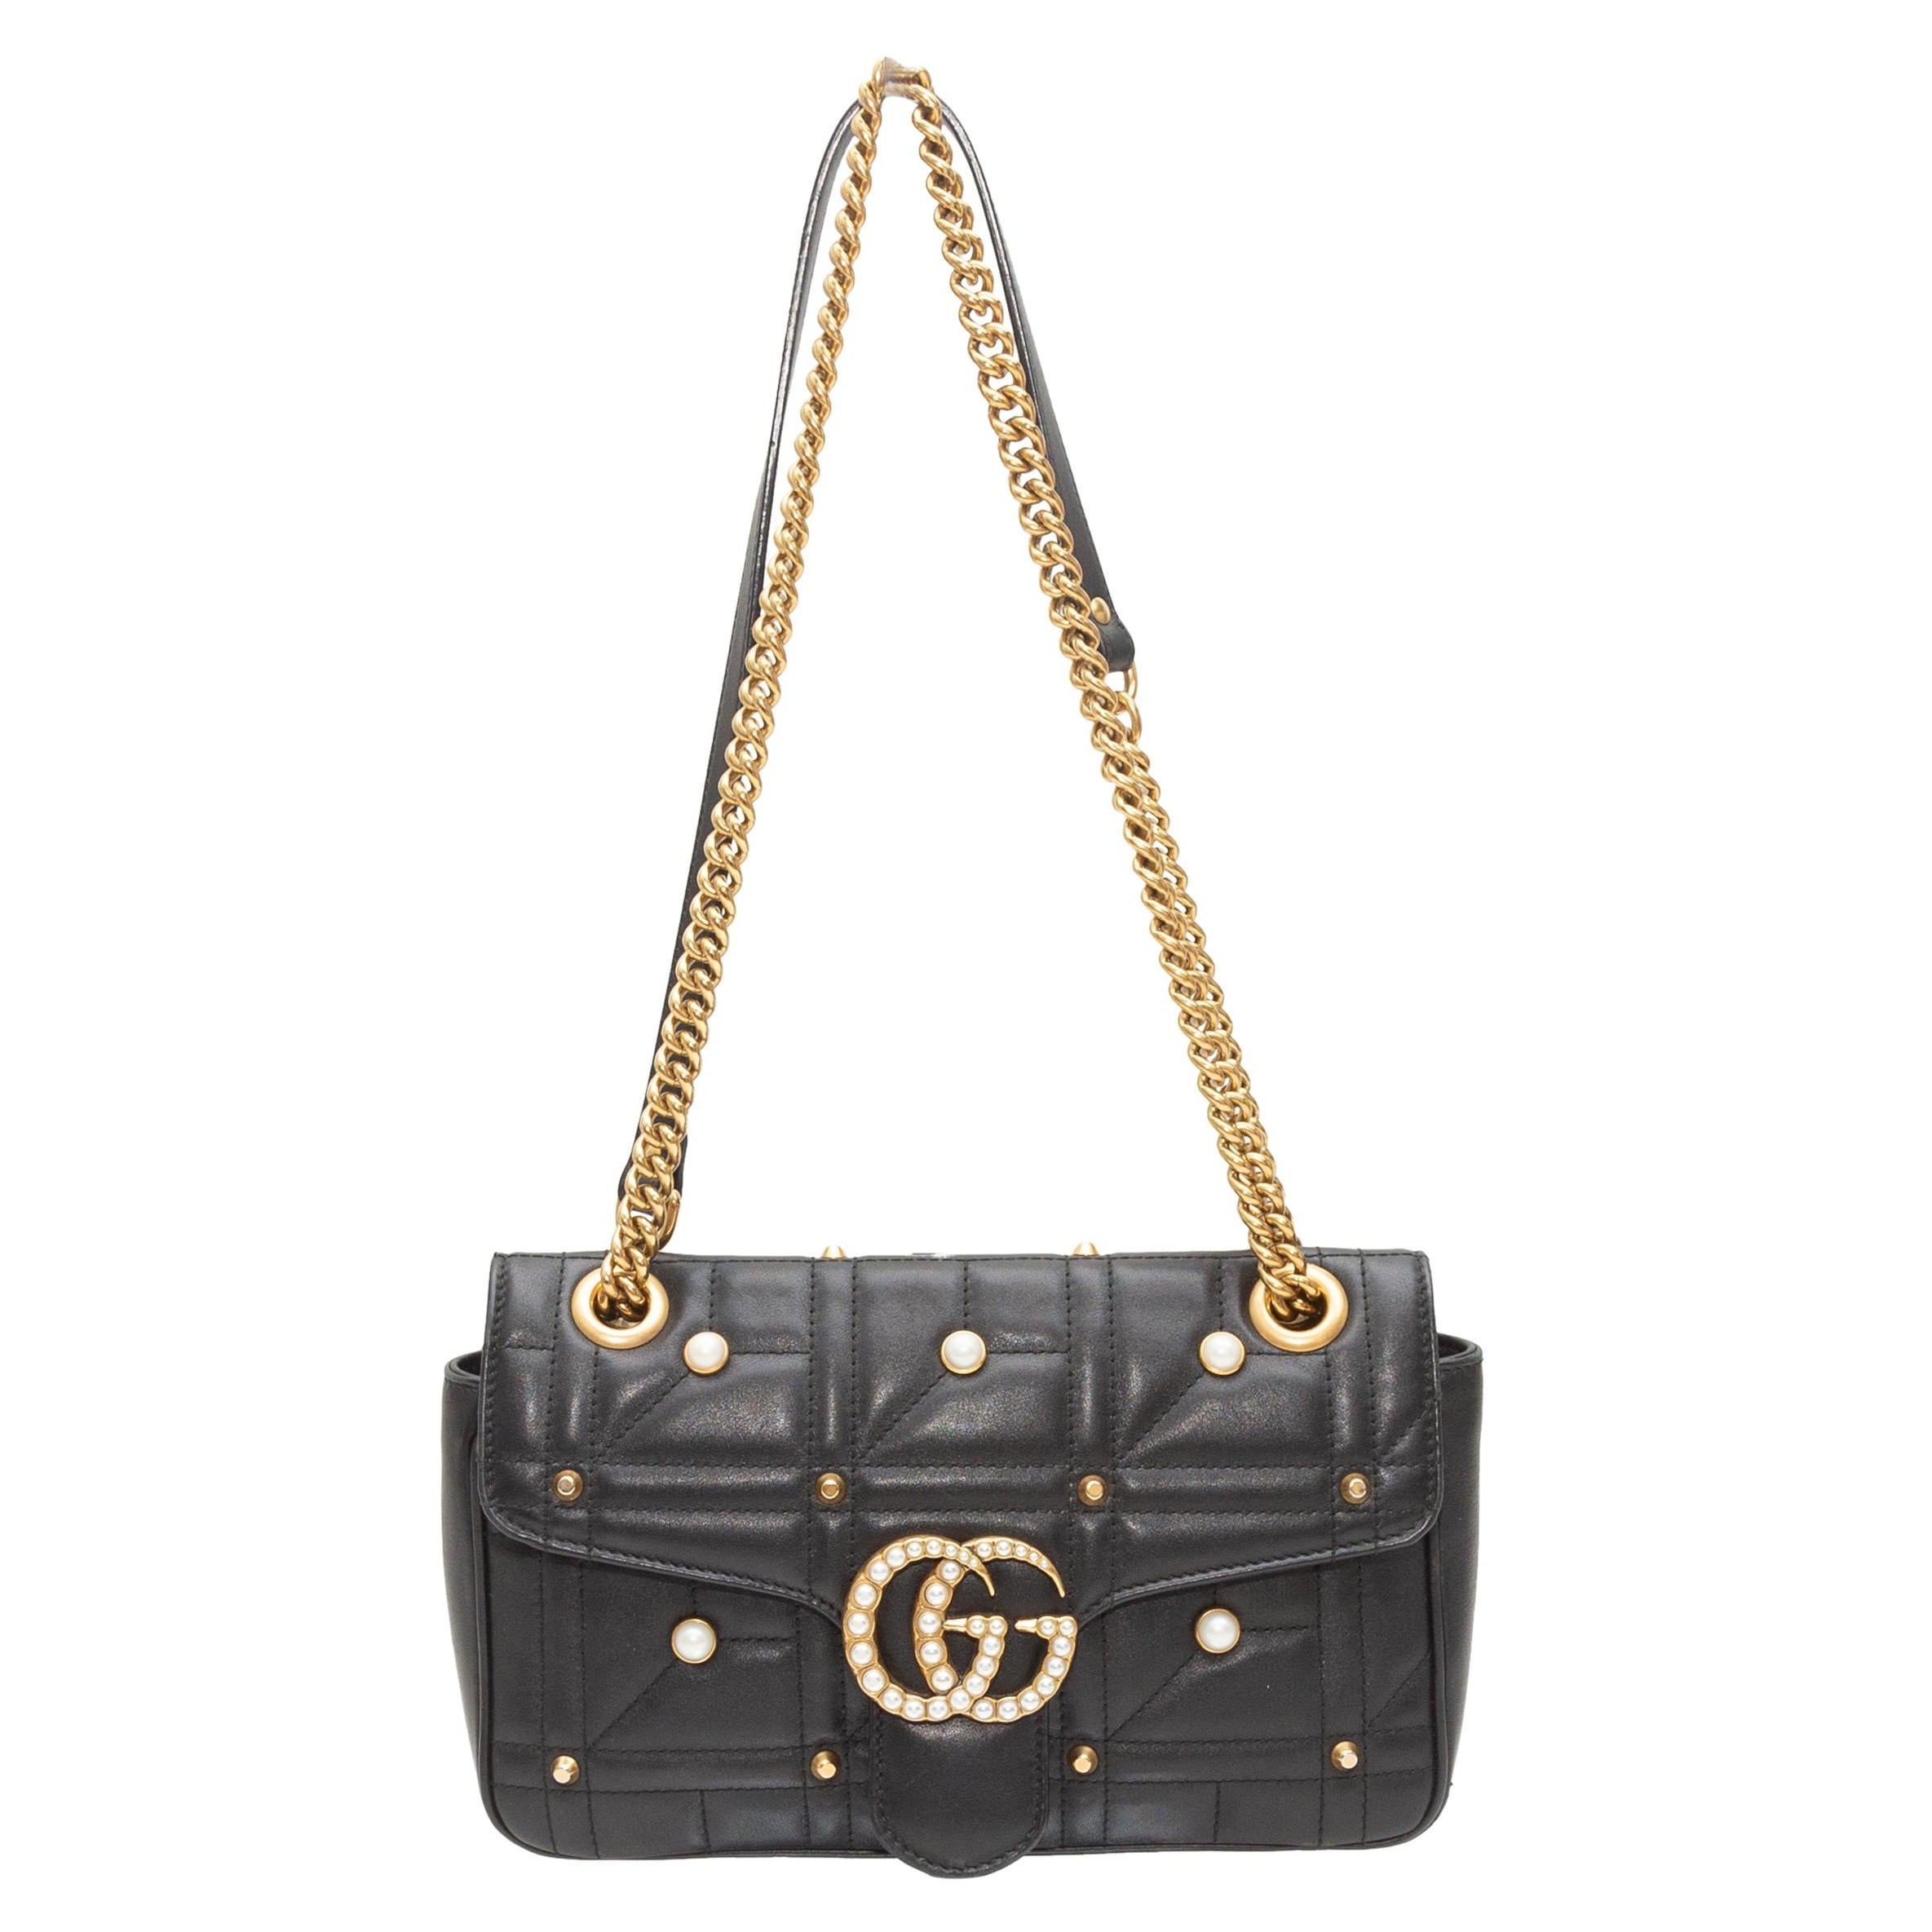 Gucci Black Small GG Marmont Matelasse Bag